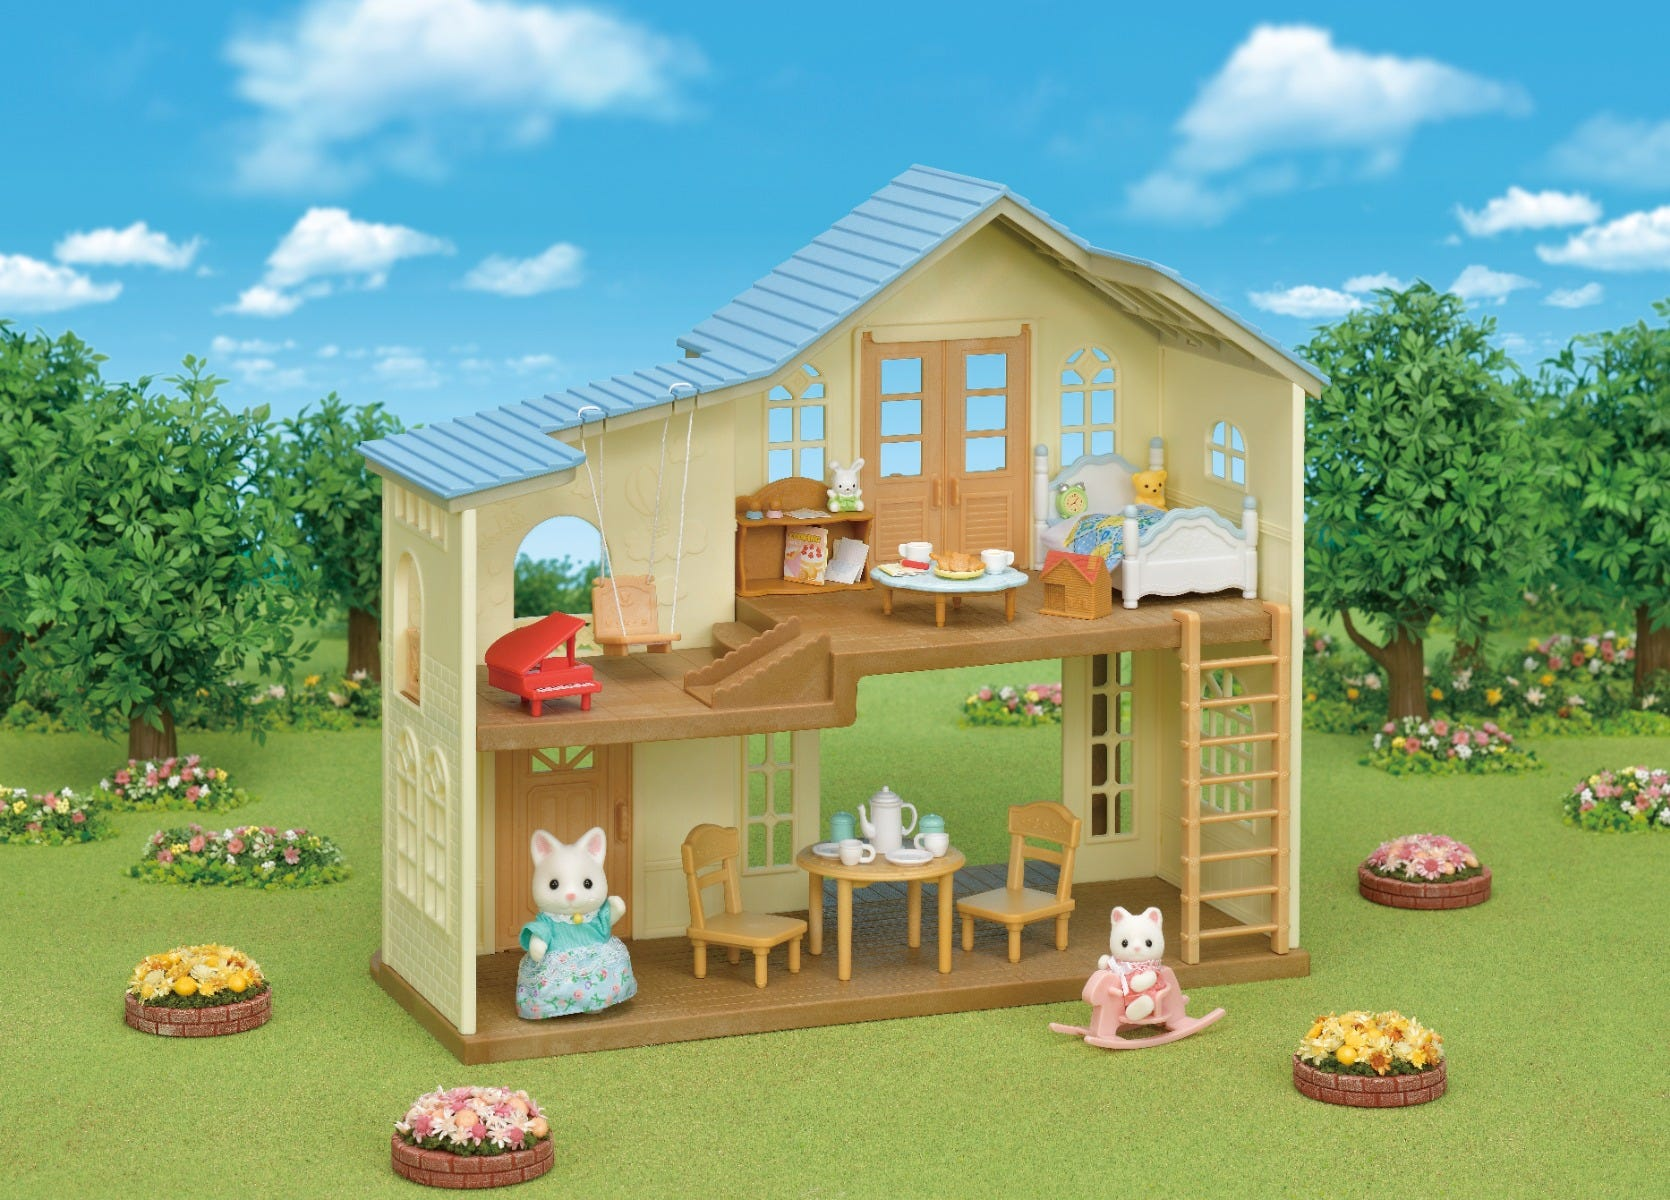 Sylvanian Families Hill Crest House Gift Set